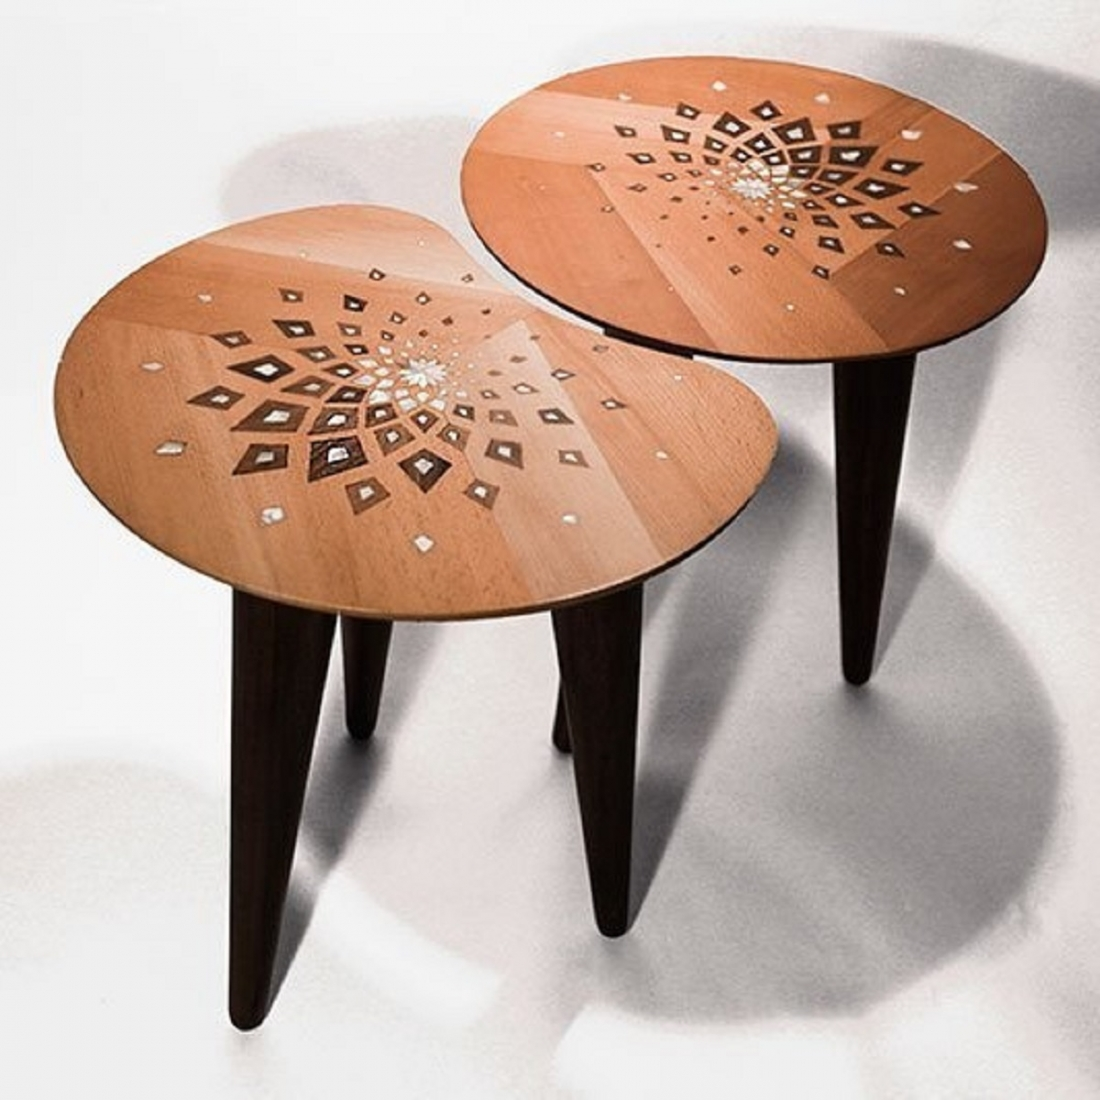 Harmonic Amoeba Design Set of 2 Walnut Tables